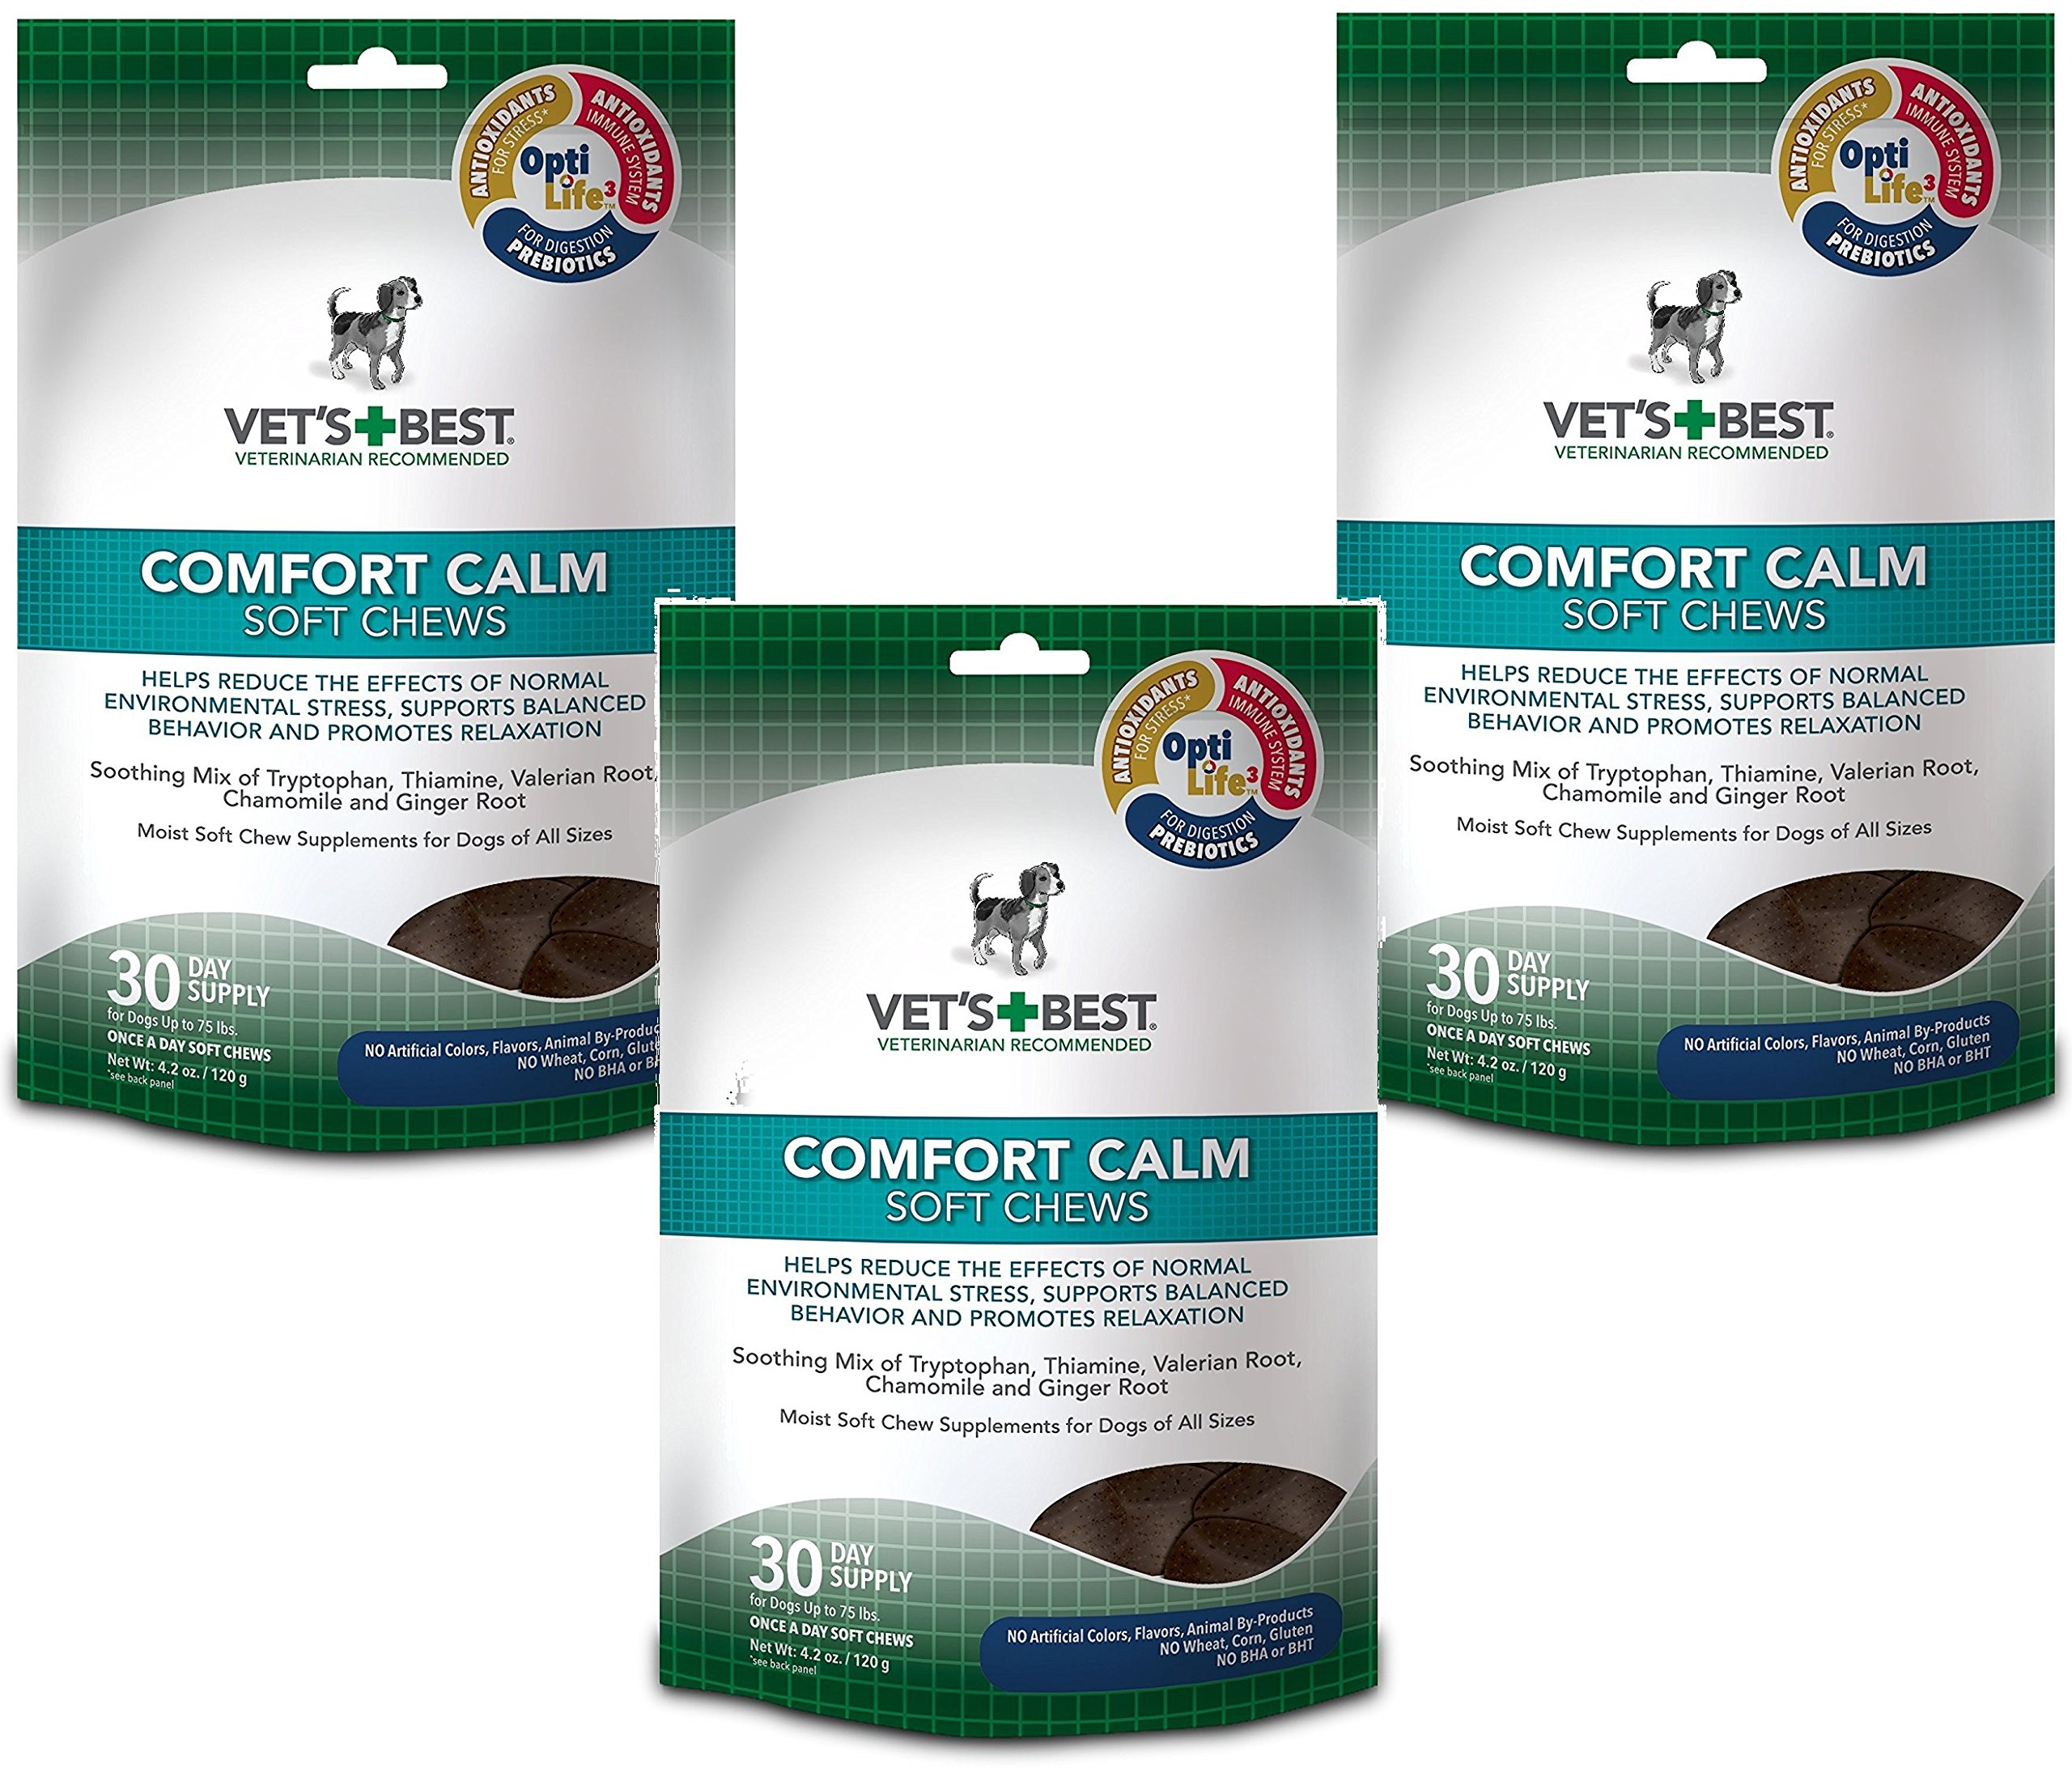 (3 Pack) Vet's Best Comfort Calm Calming Soft Chews Dog Supplements, Each a 30 Day Supply